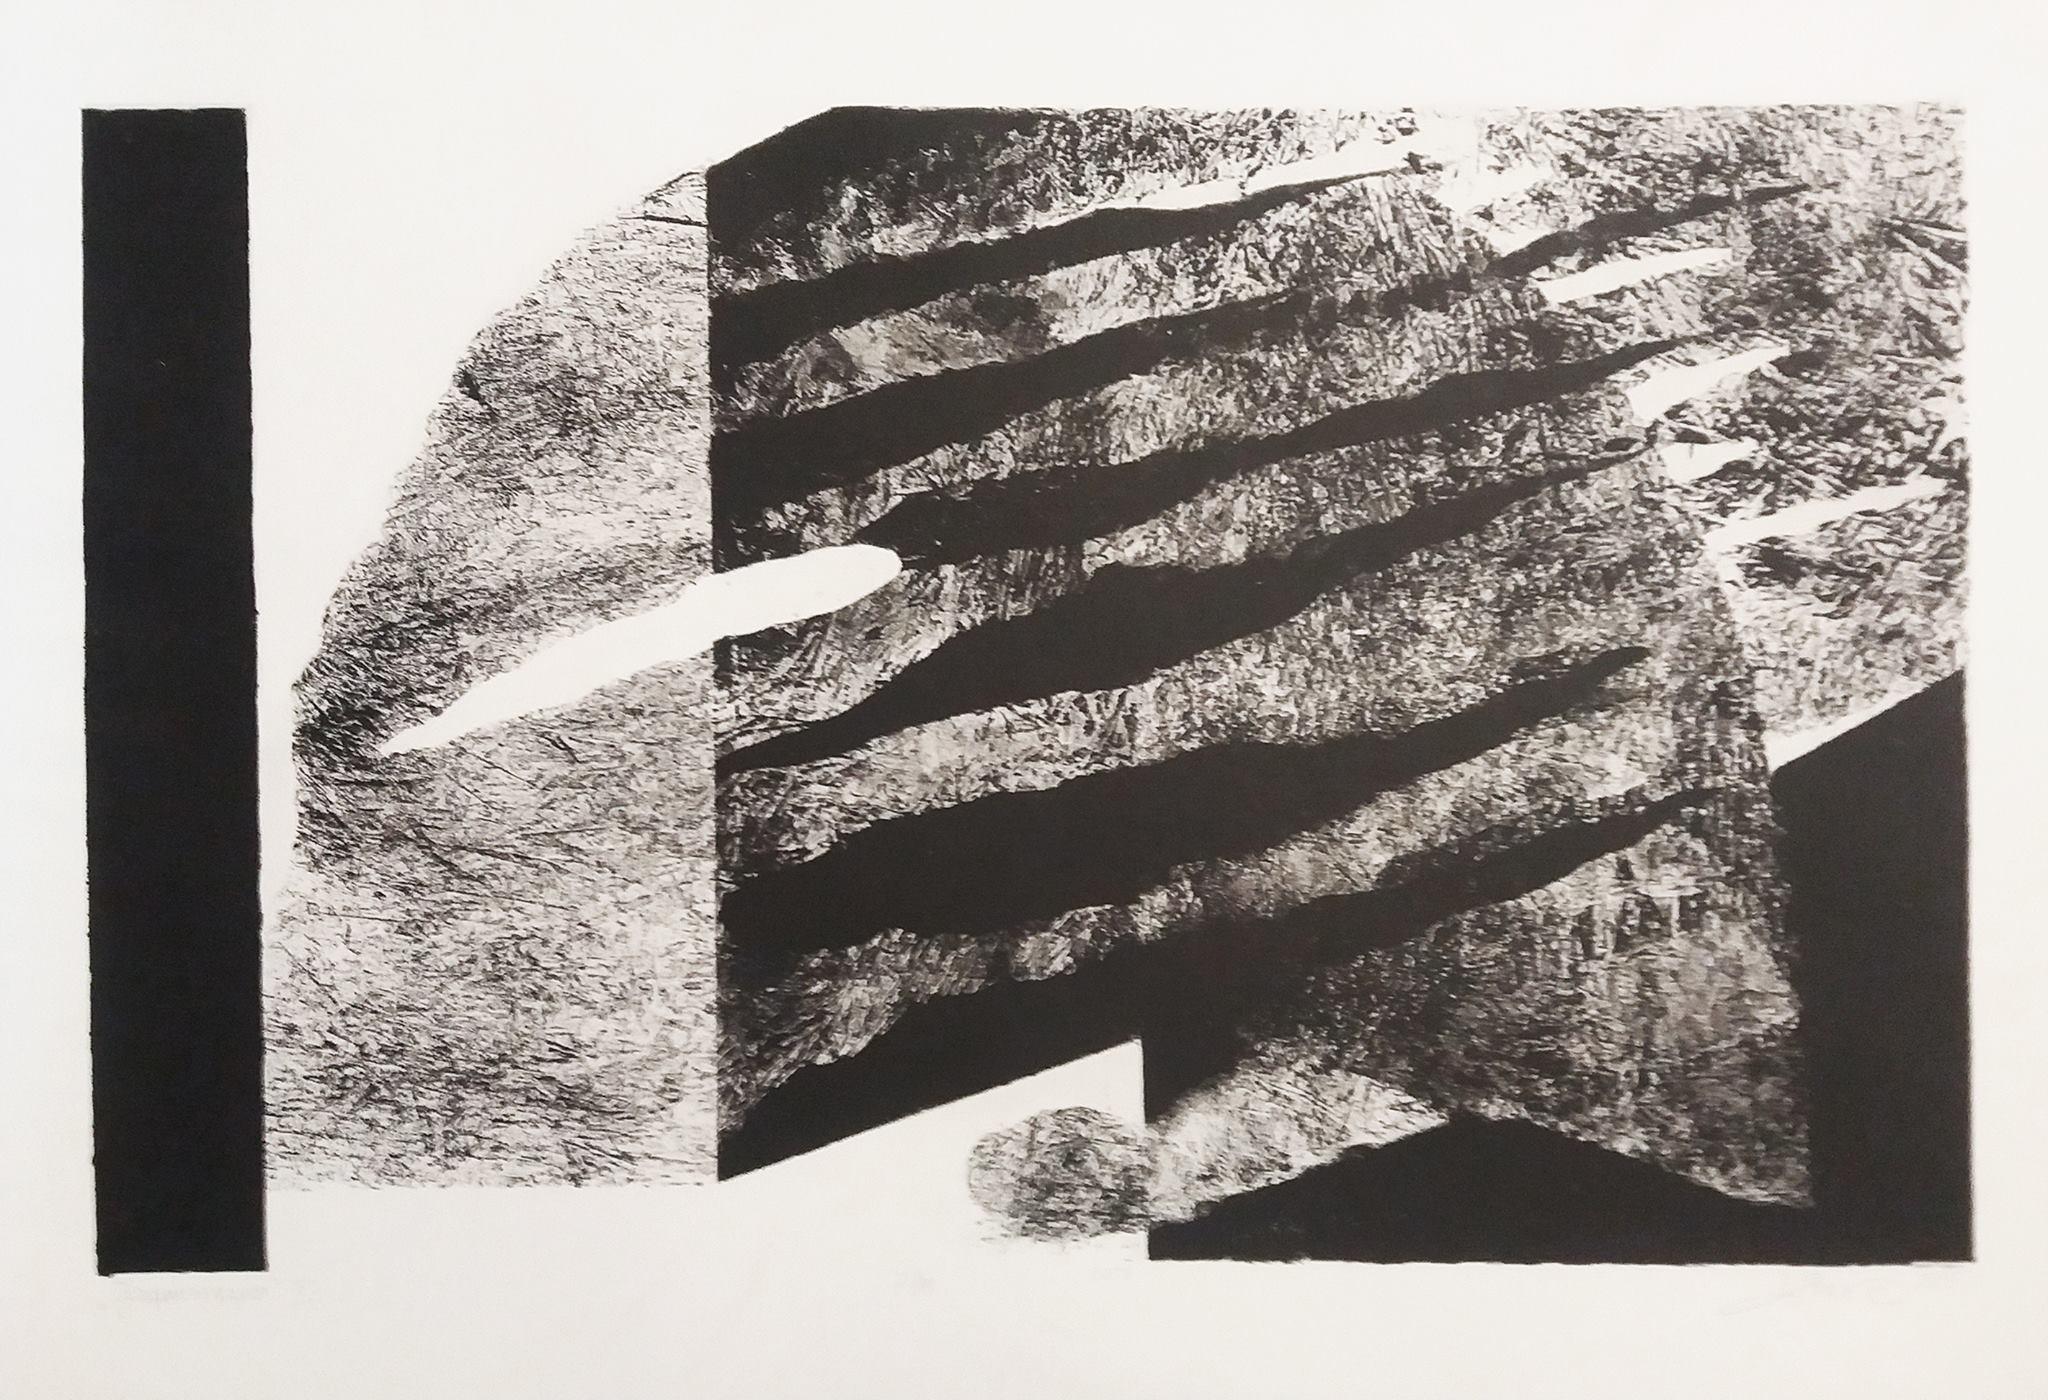 Denica VESELINOVA JANEVA (1974) Bulgaria Fragmentation II, 2015 Graphics, 70 x 100 cm